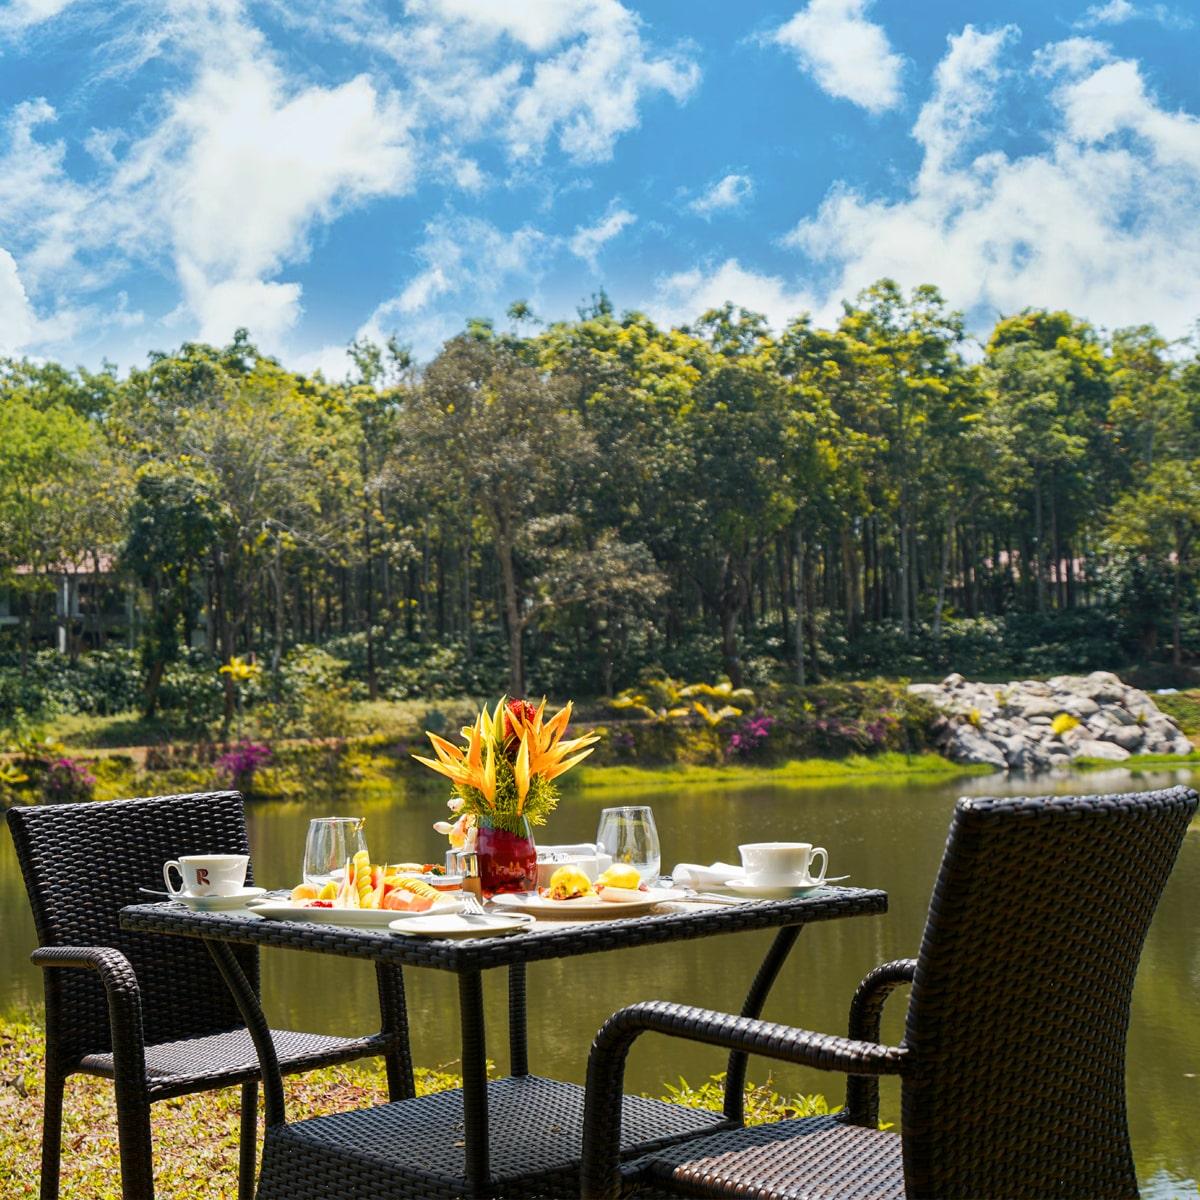 Rosetta by Ferns, Sakleshpur - A Luxury Nature Resort